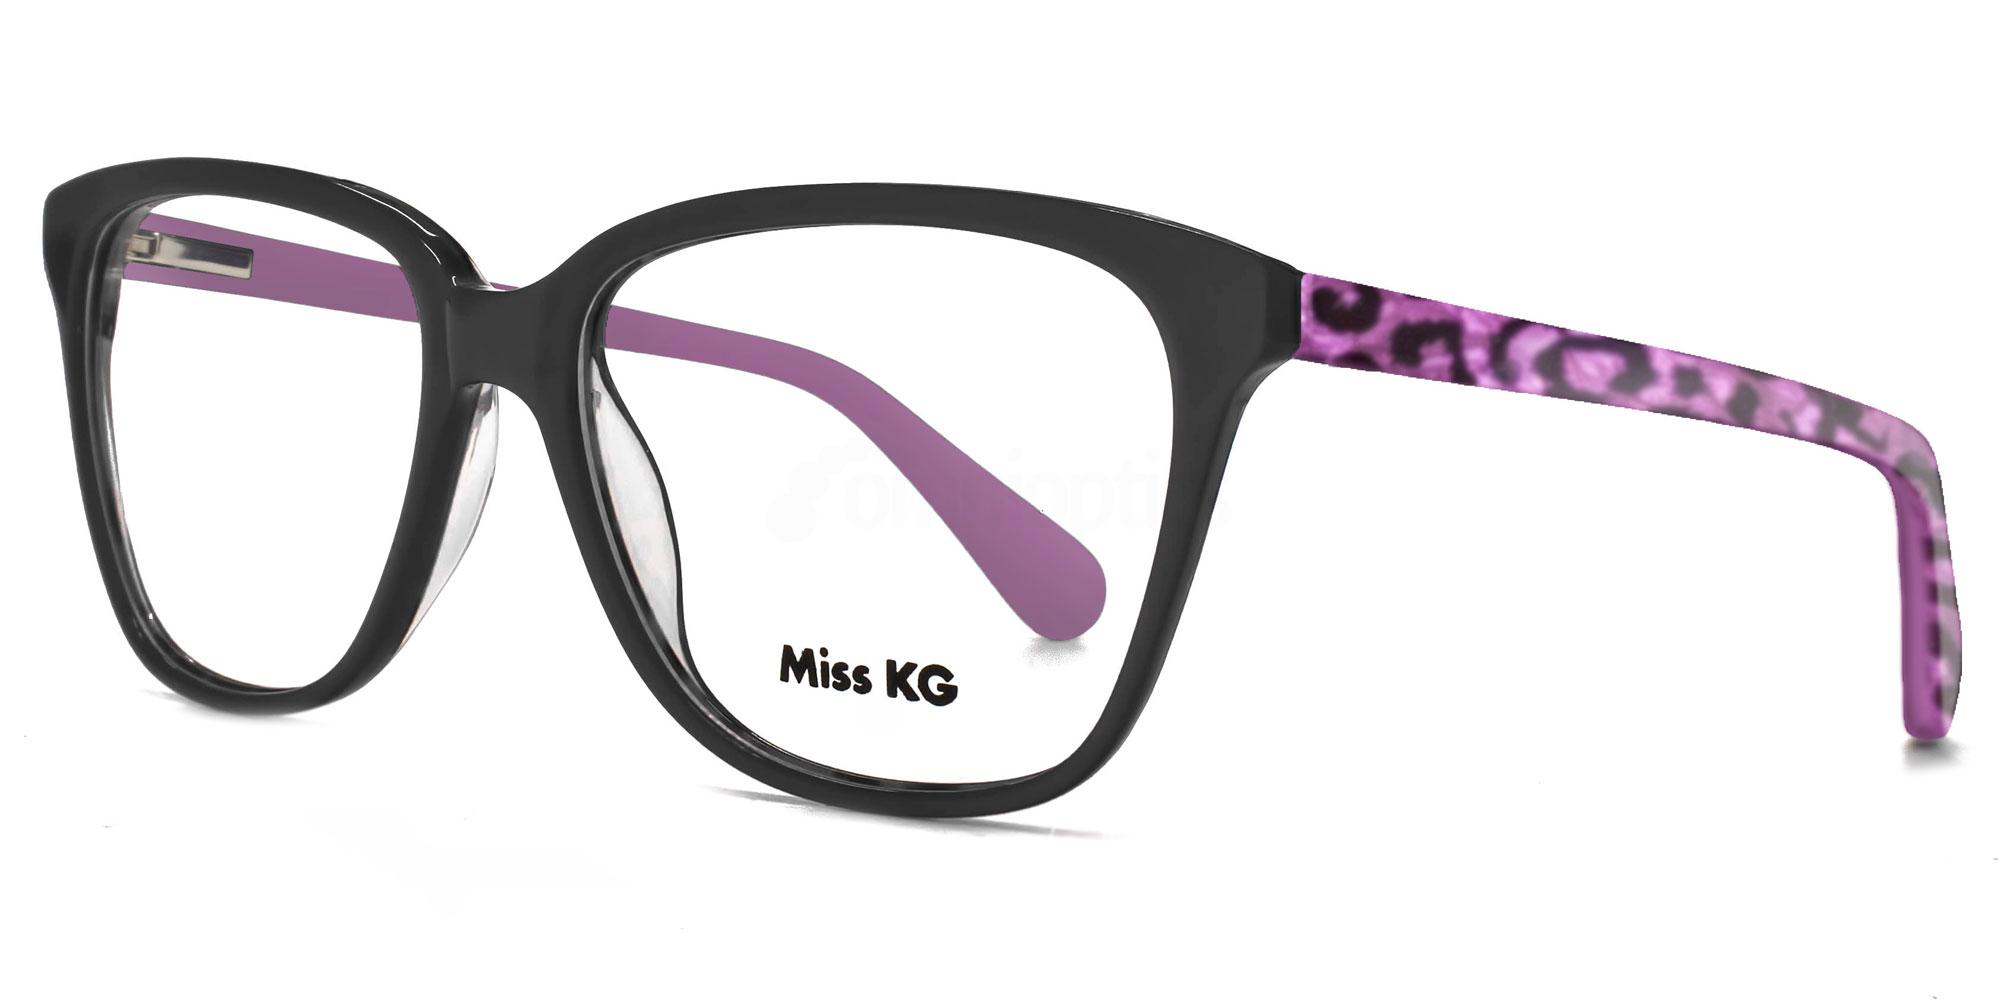 BLK MKGS003 , Miss KG